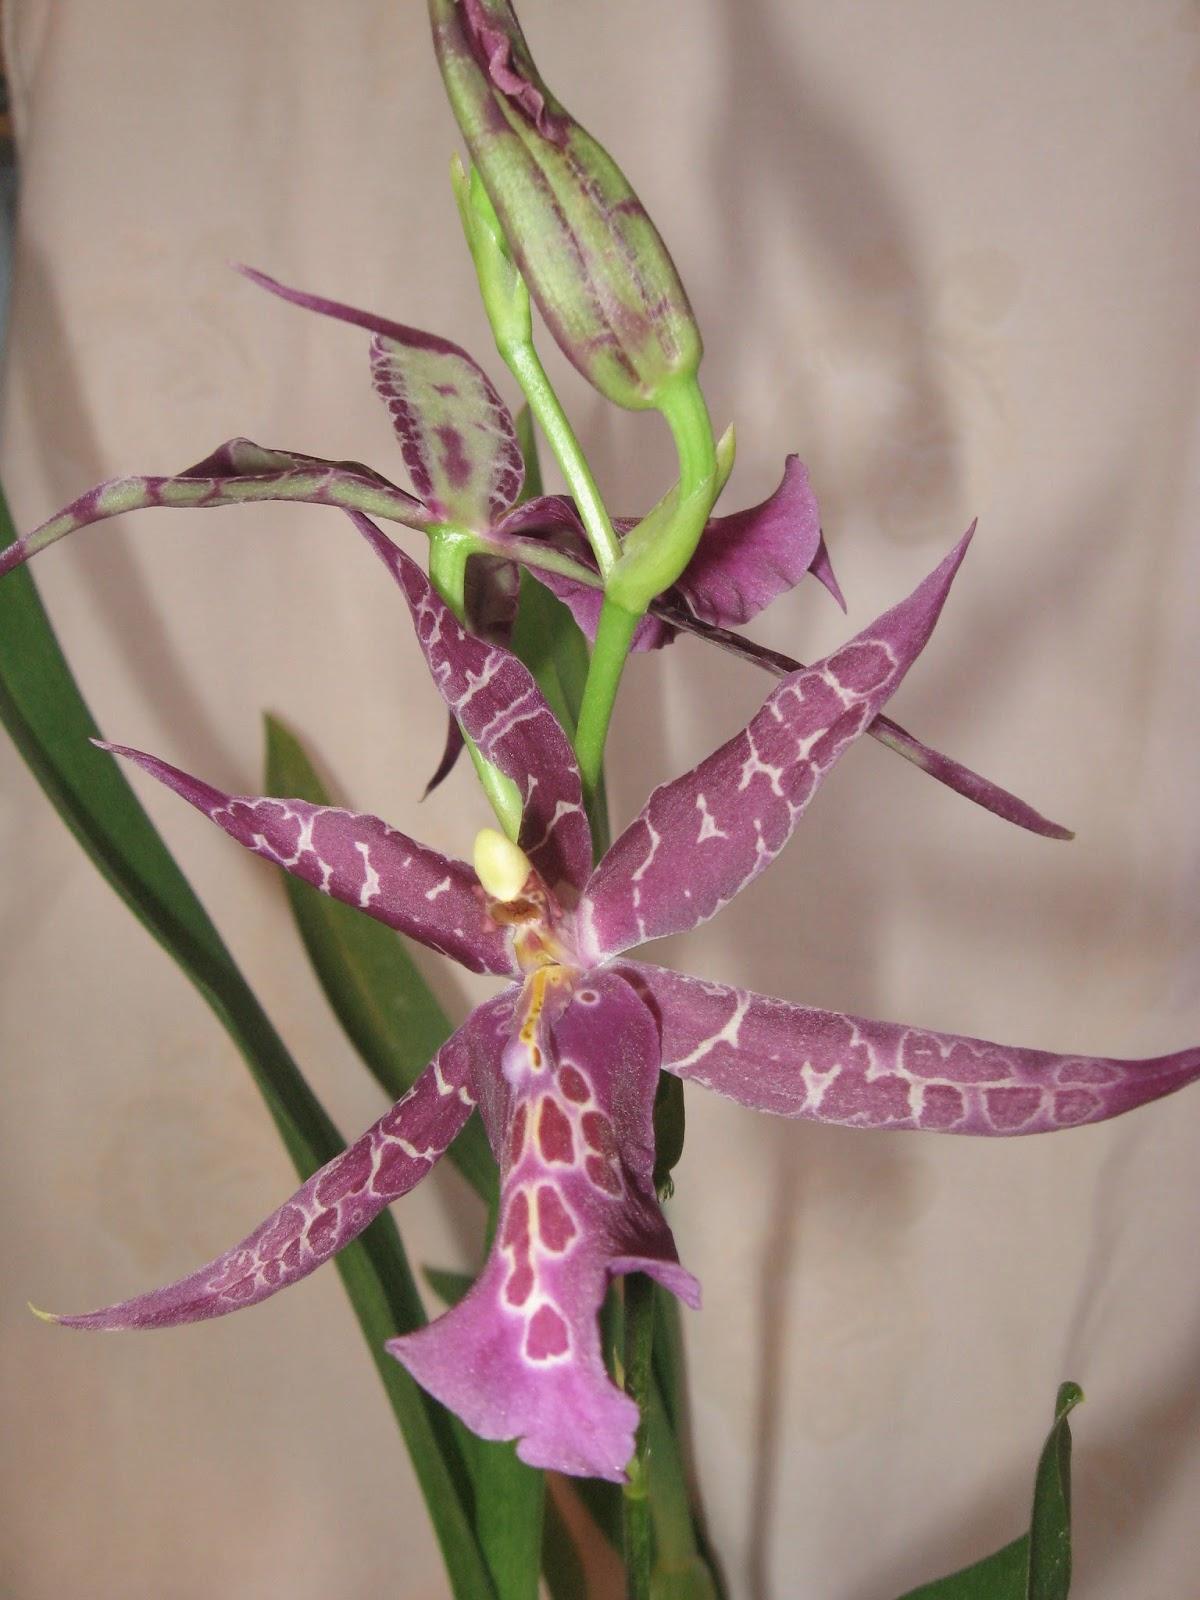 Miltassia Sadie Loo x Miltonidium Christmas Eve. Цветы орхидеи